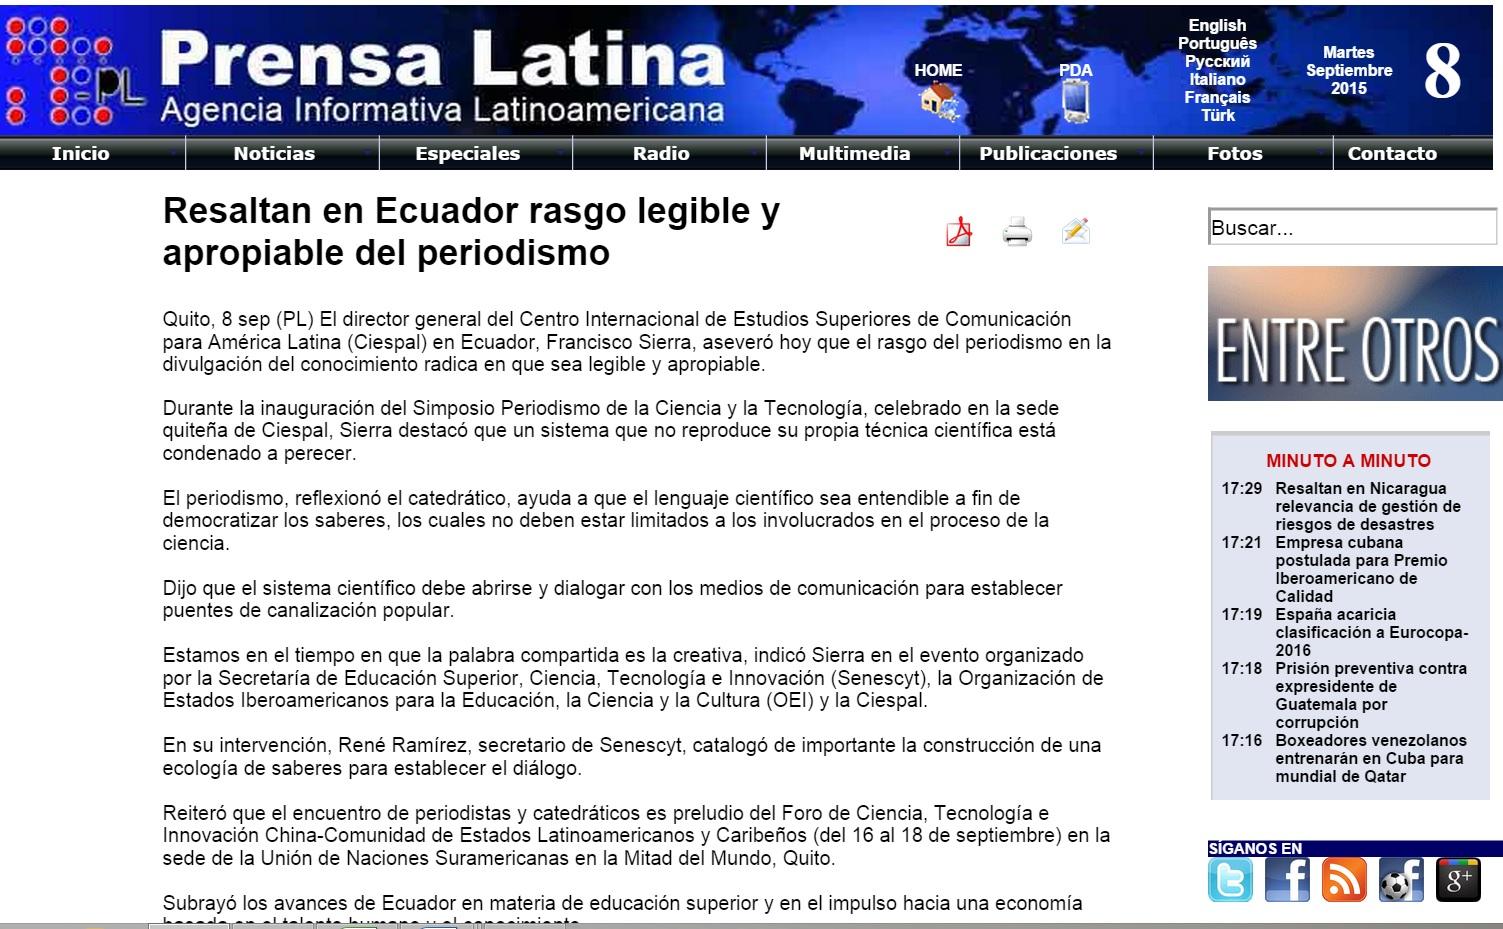 Prensa_Latina_FS_SimposioCyT